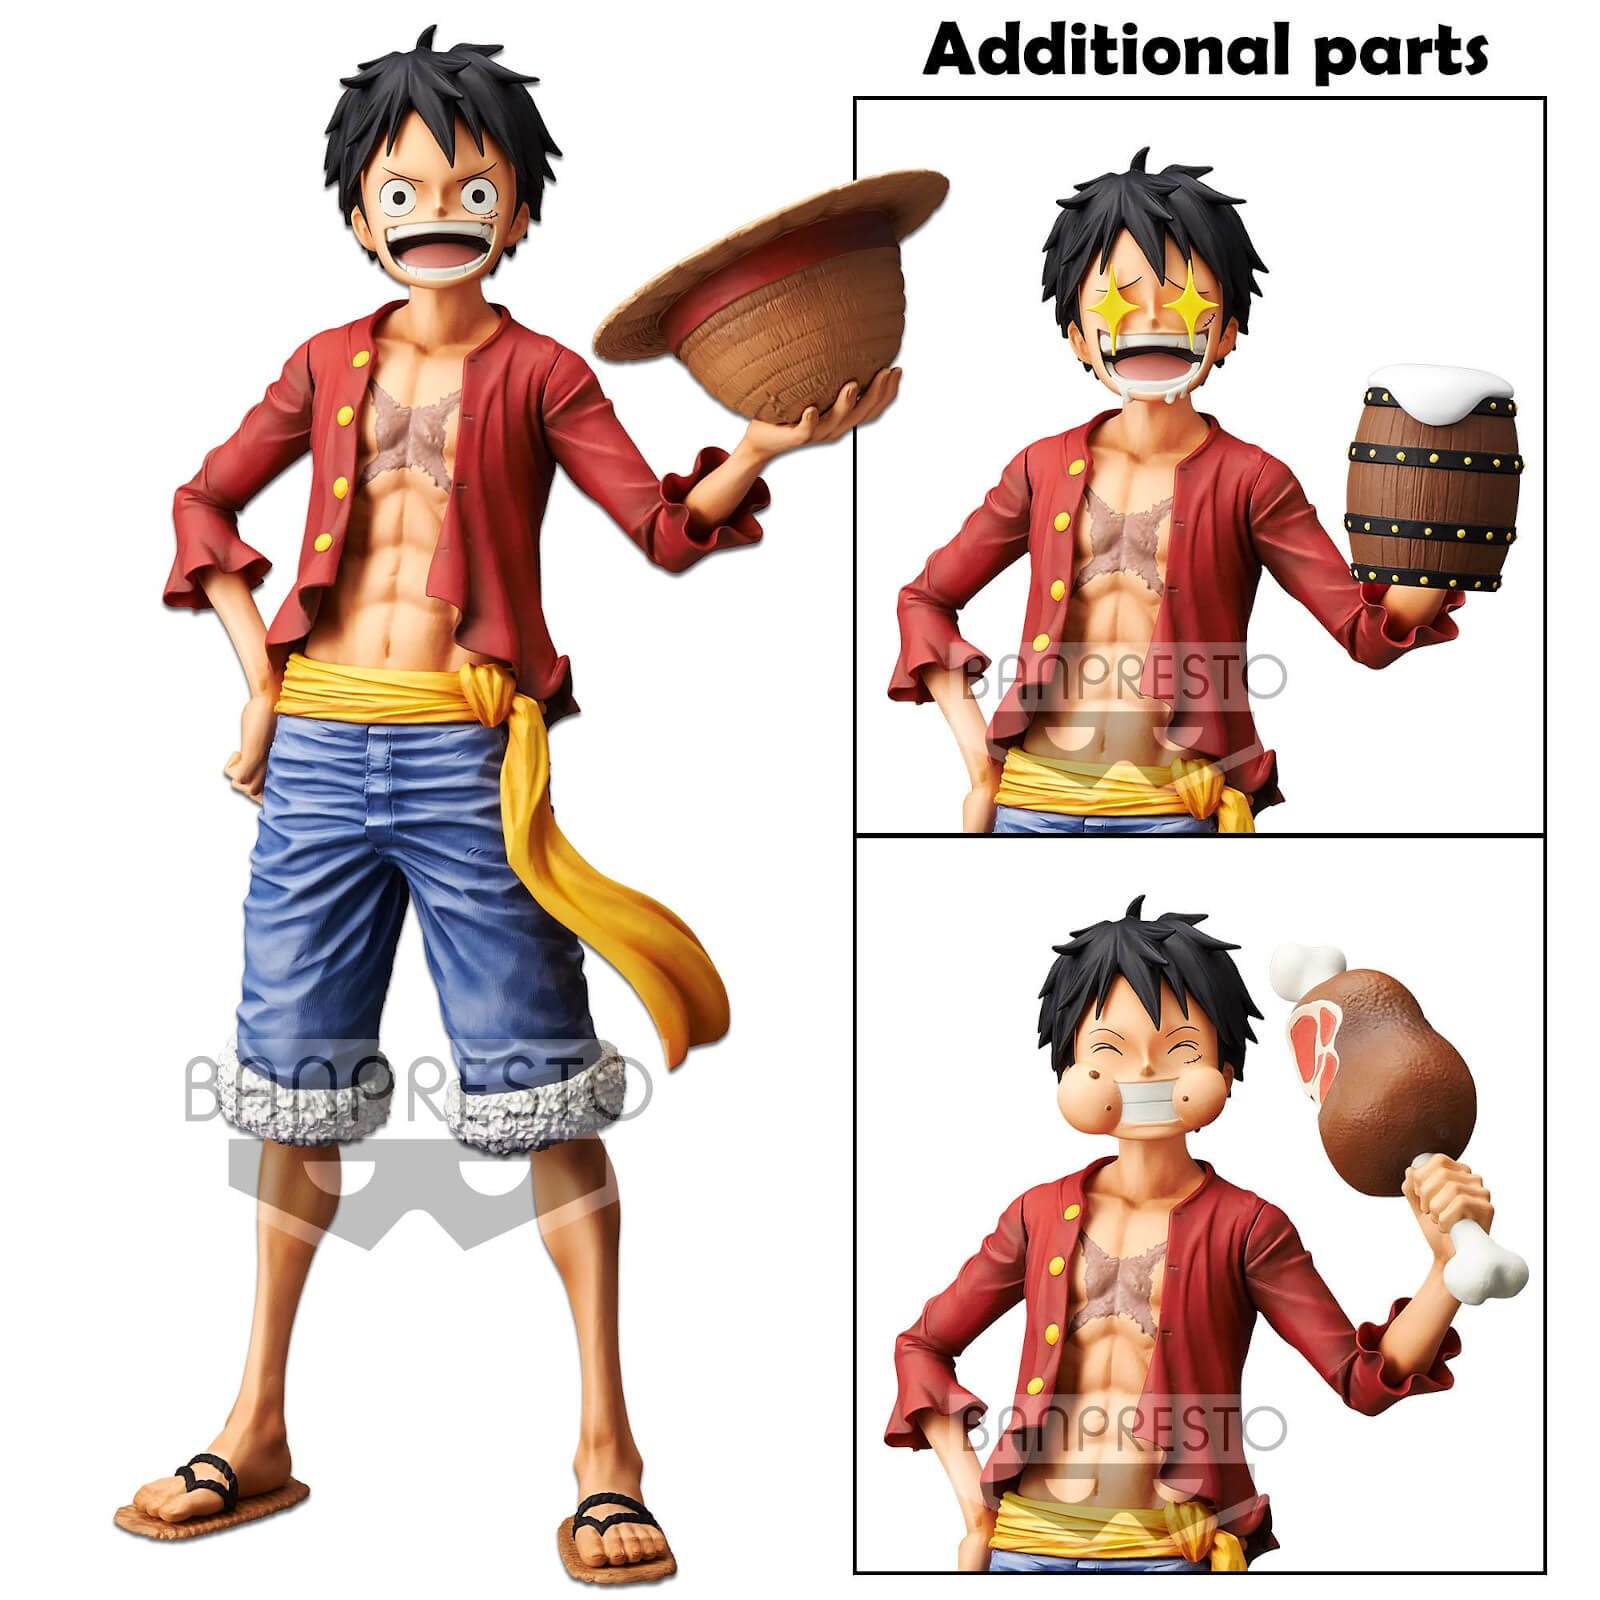 Image of Banpresto One Piece Monkey.D.Luffy Grandista Nero Statue